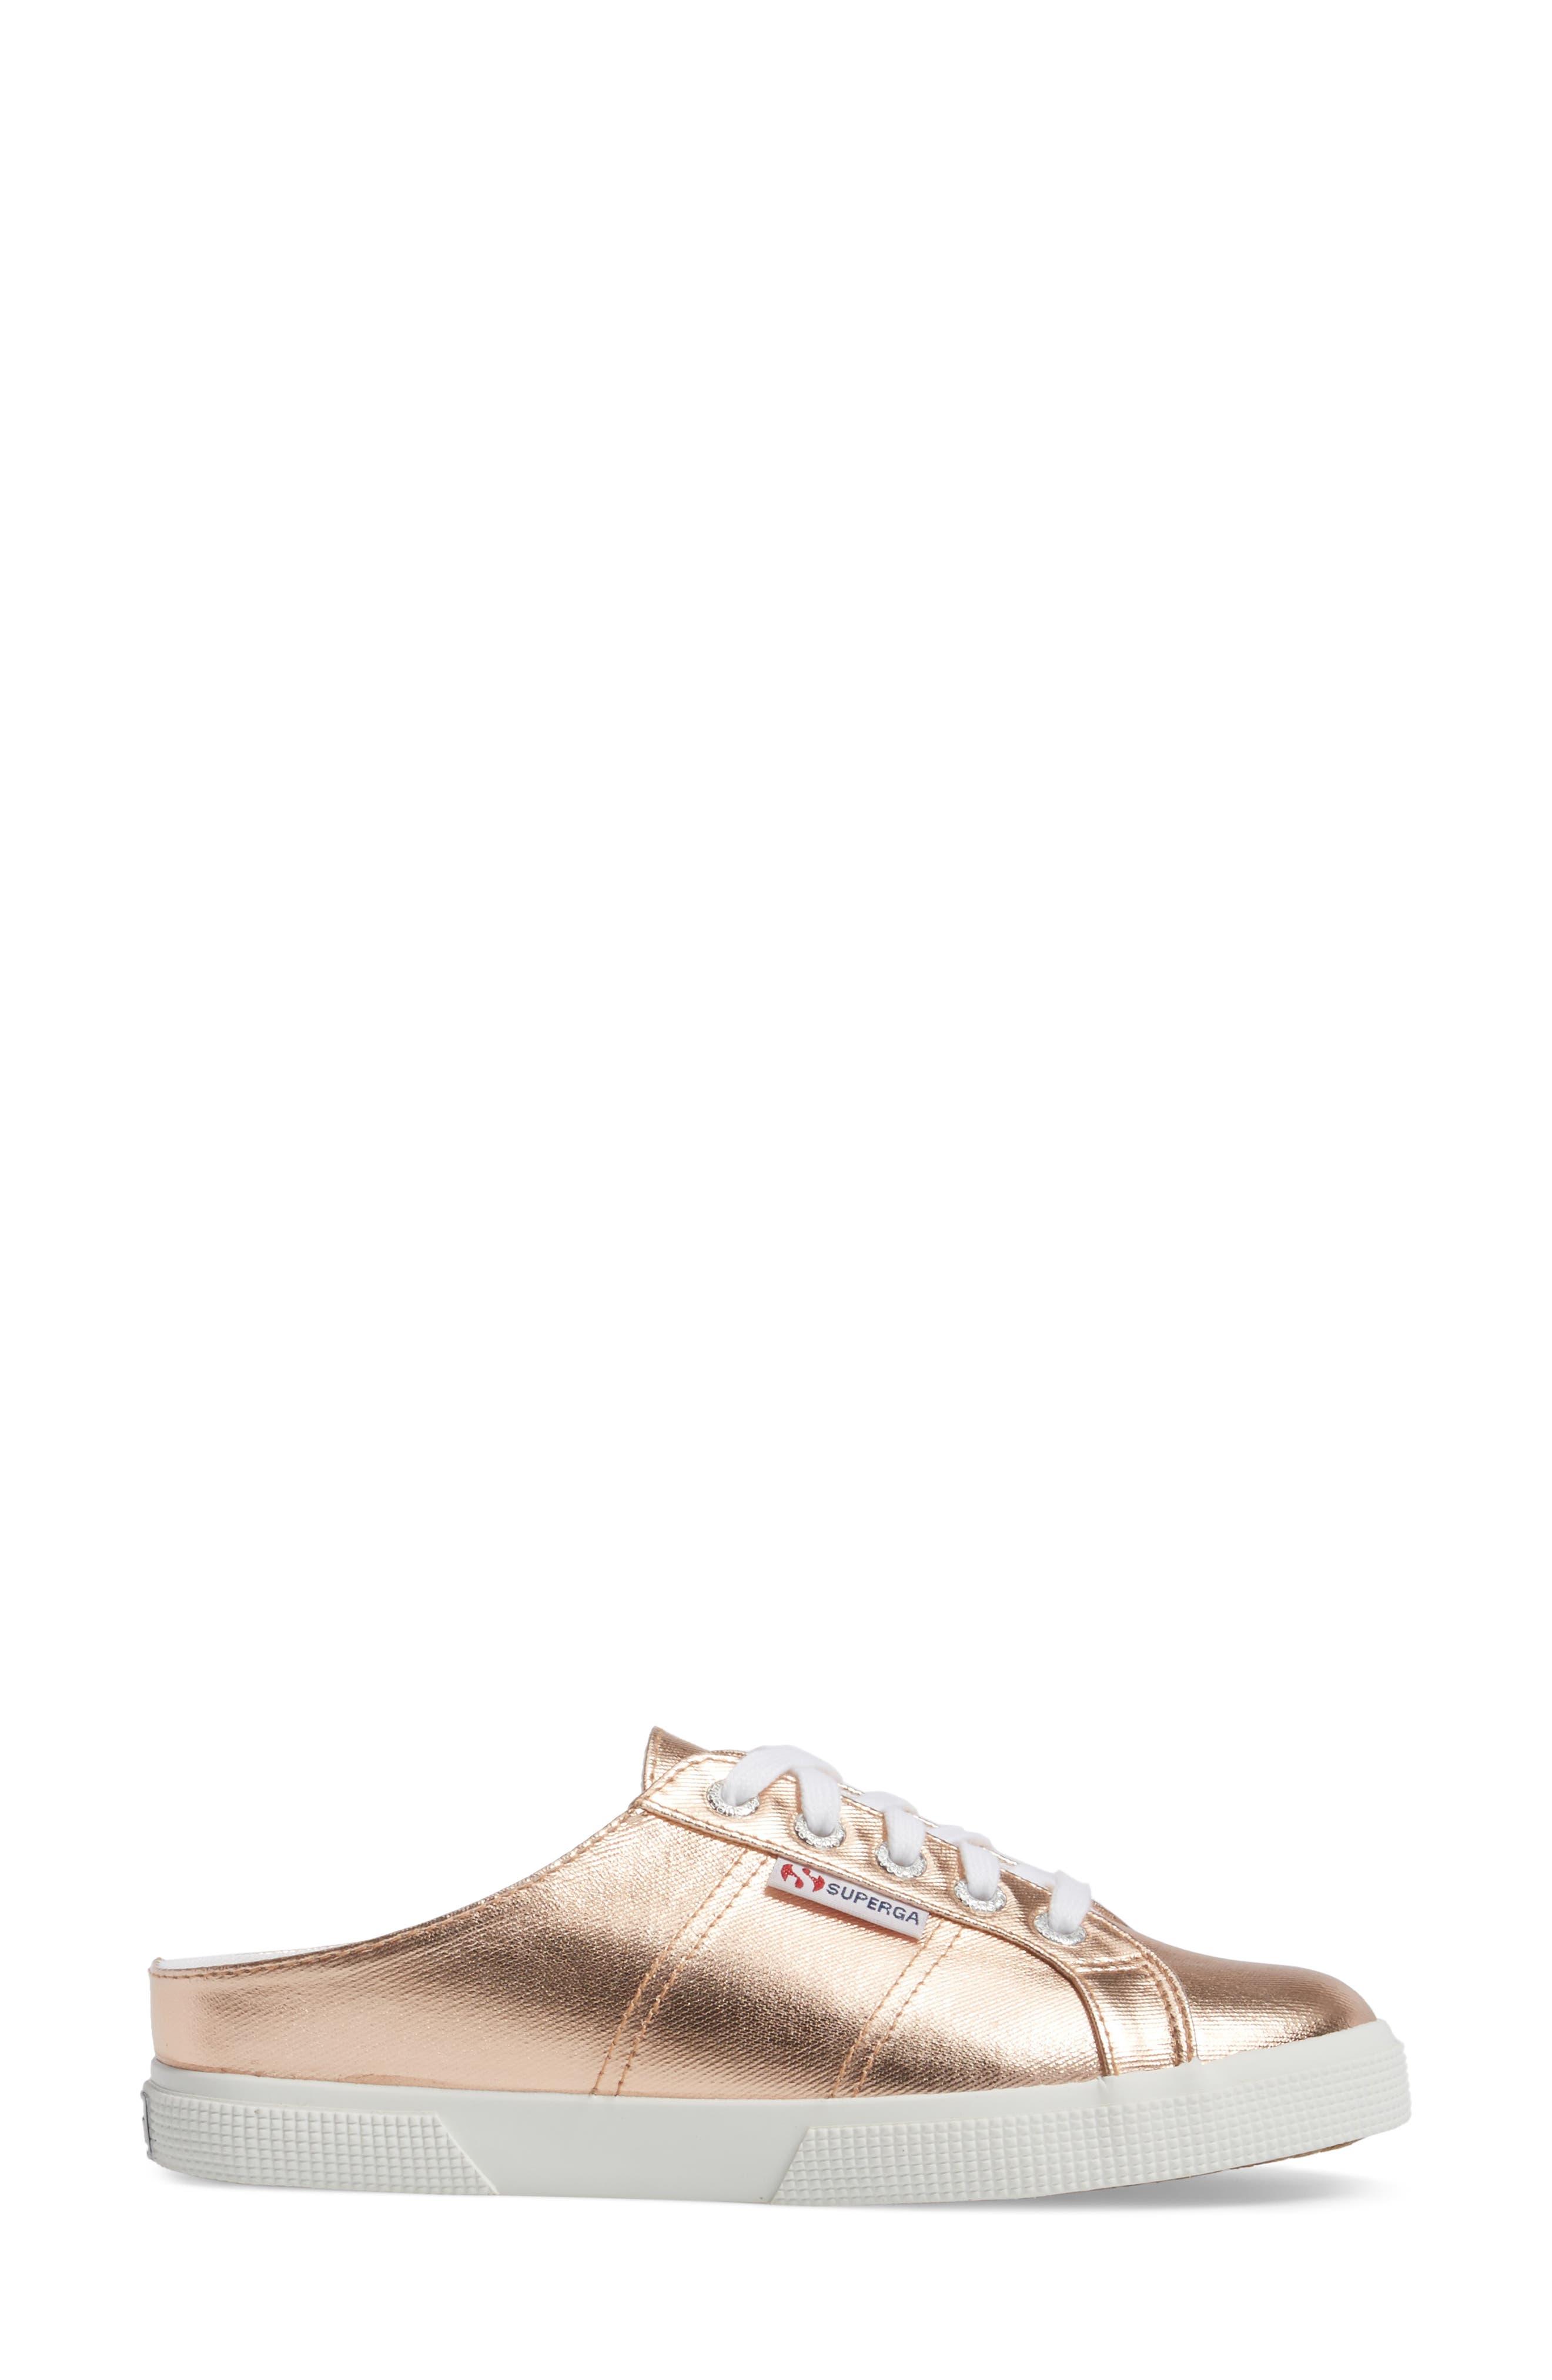 2288 Sneaker Mule,                             Alternate thumbnail 3, color,                             Rose Gold